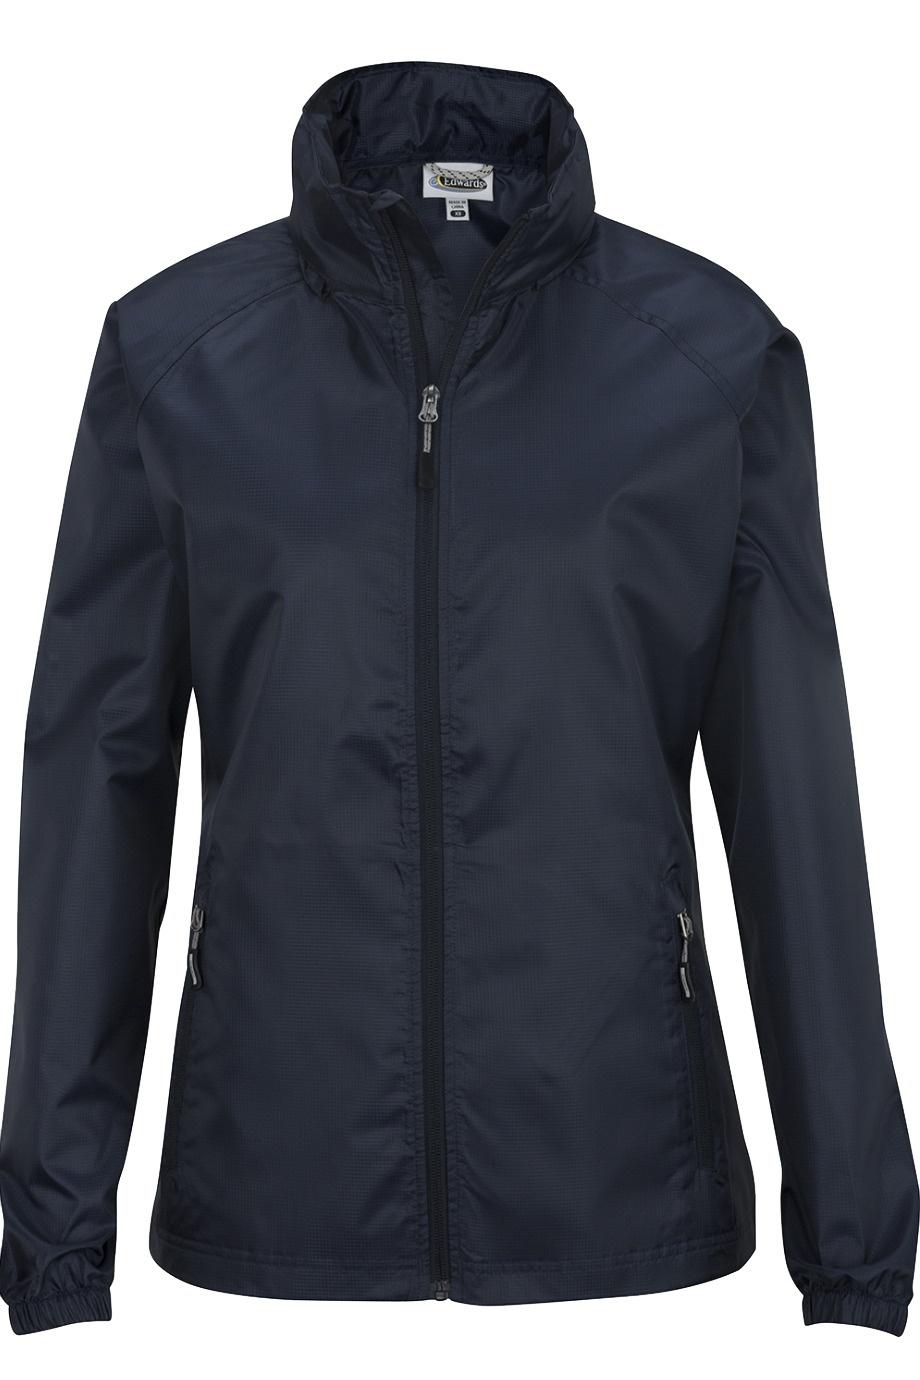 'Edwards 6435 Hooded Rain Jacket - Ladies''